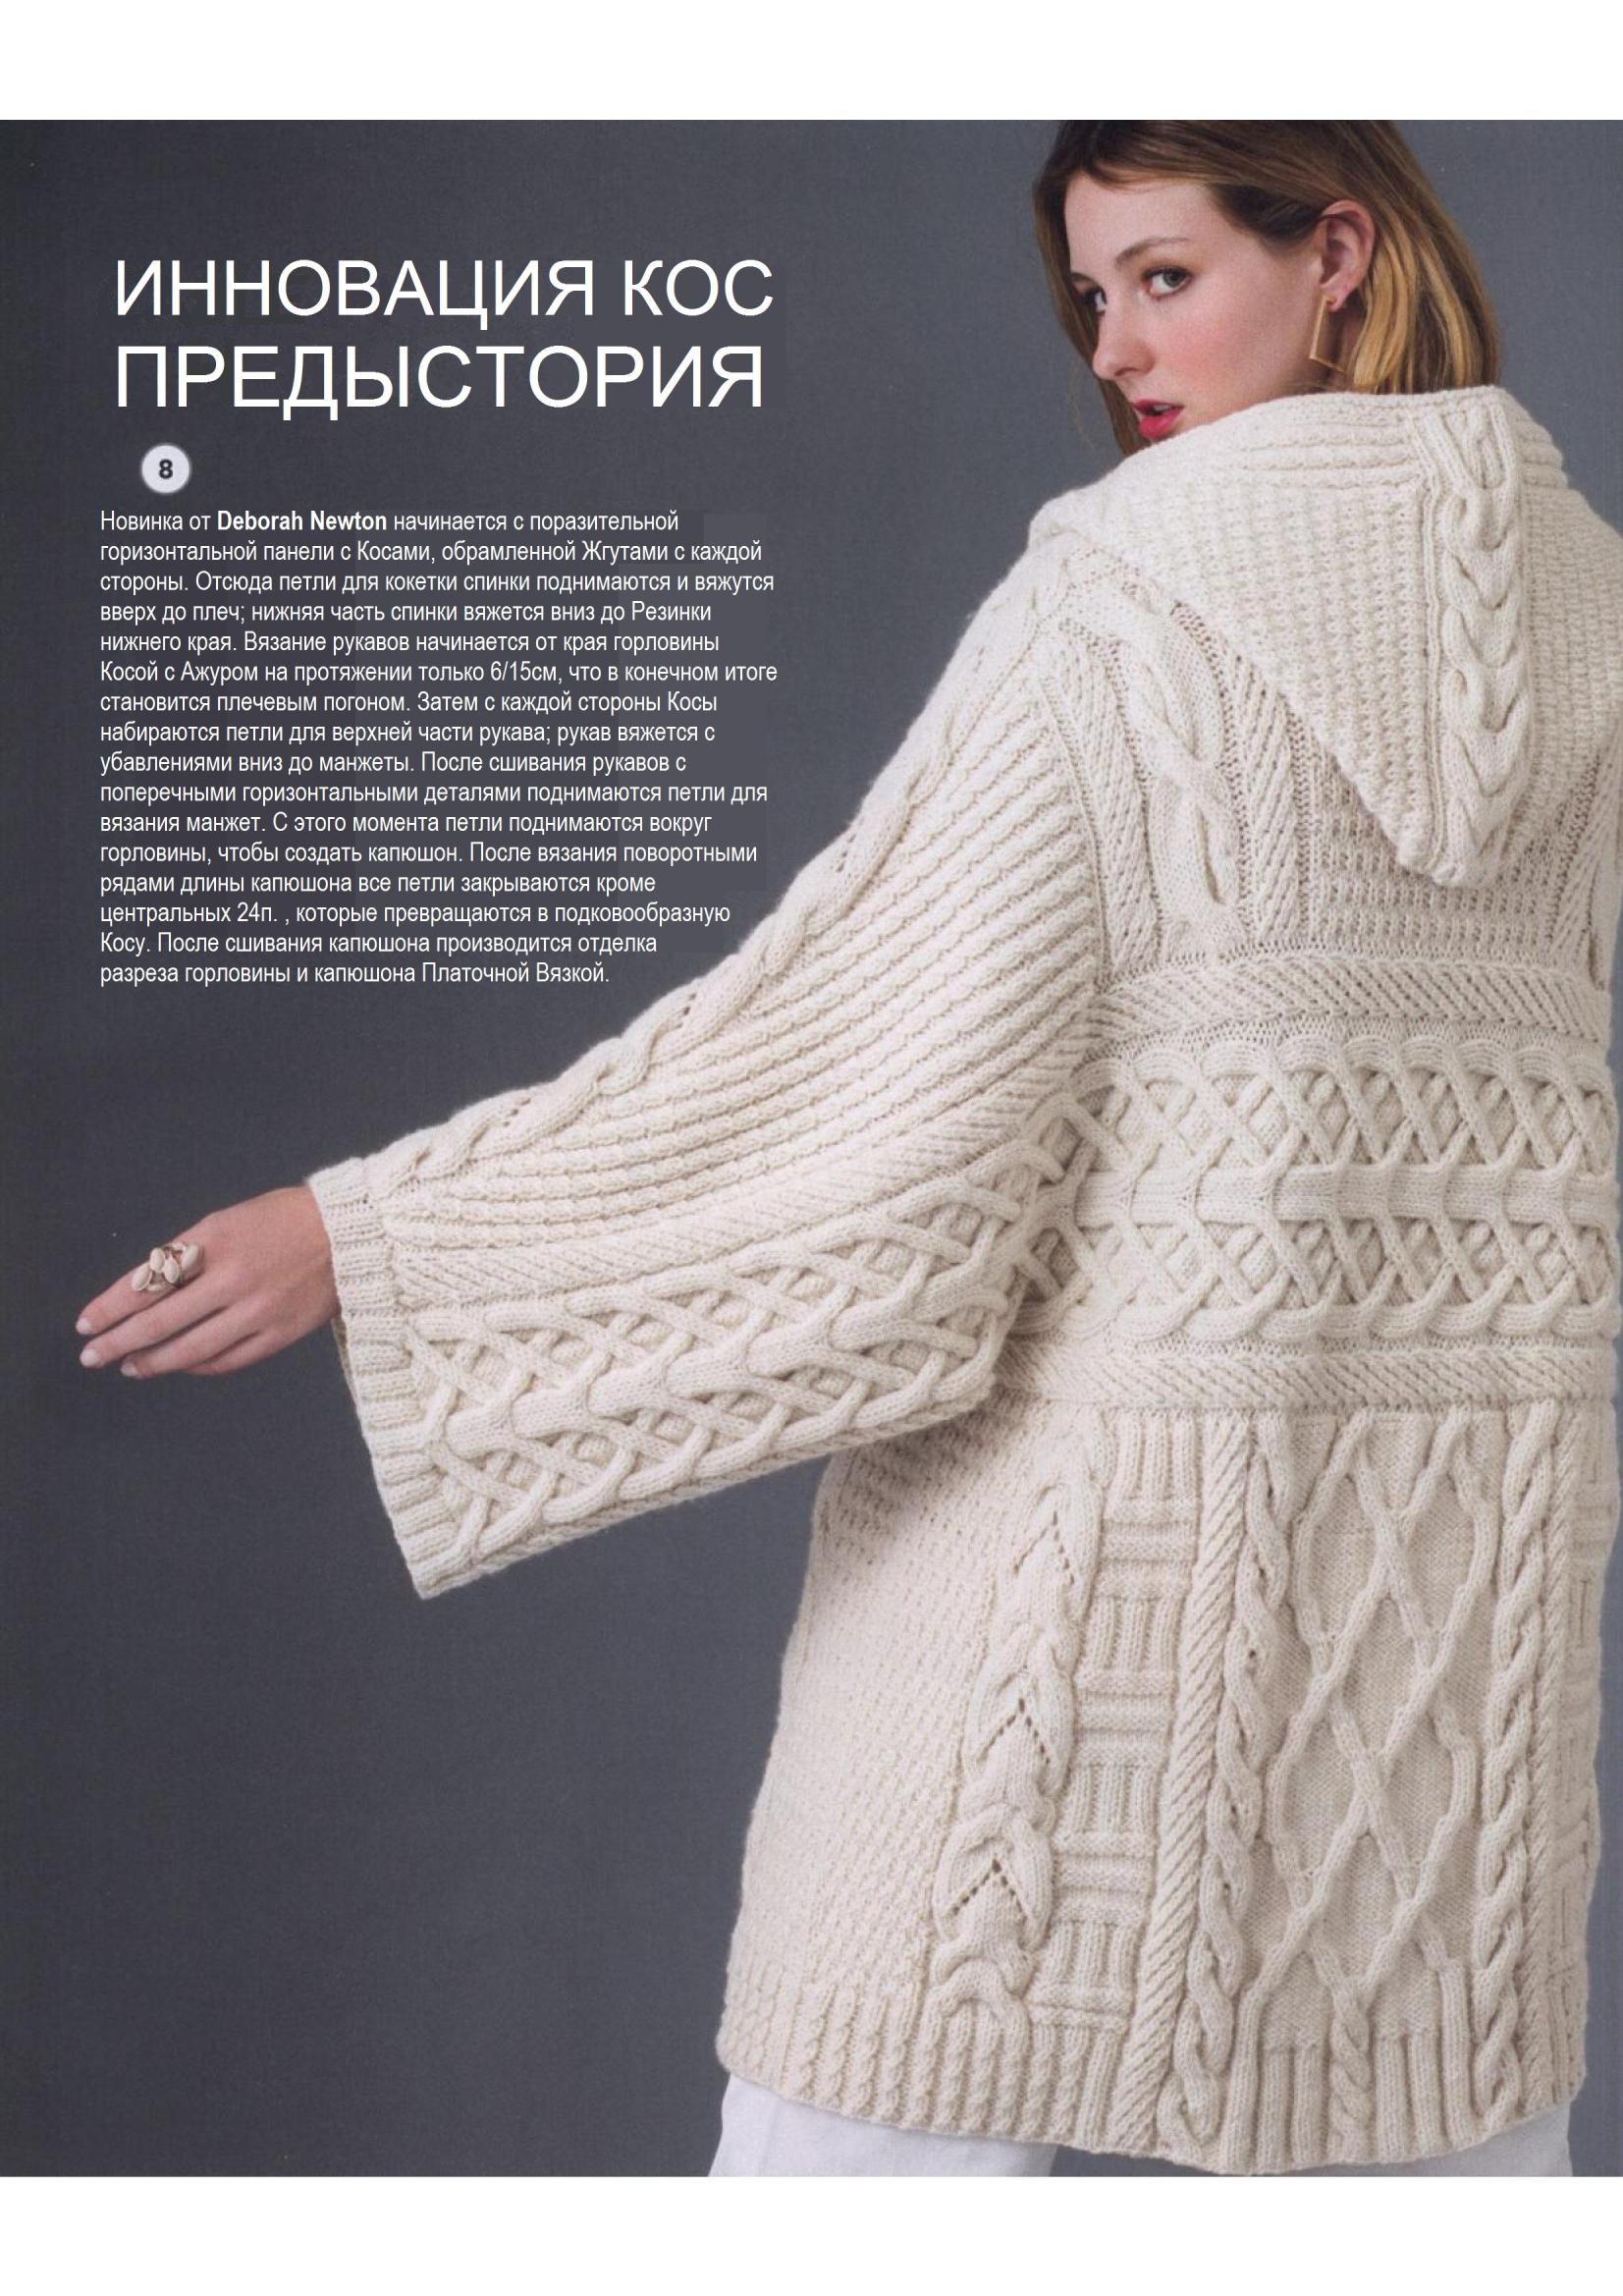 http://images.vfl.ru/ii/1504011436/36e06104/18411029.jpg | КАРДИГАНЫ ...